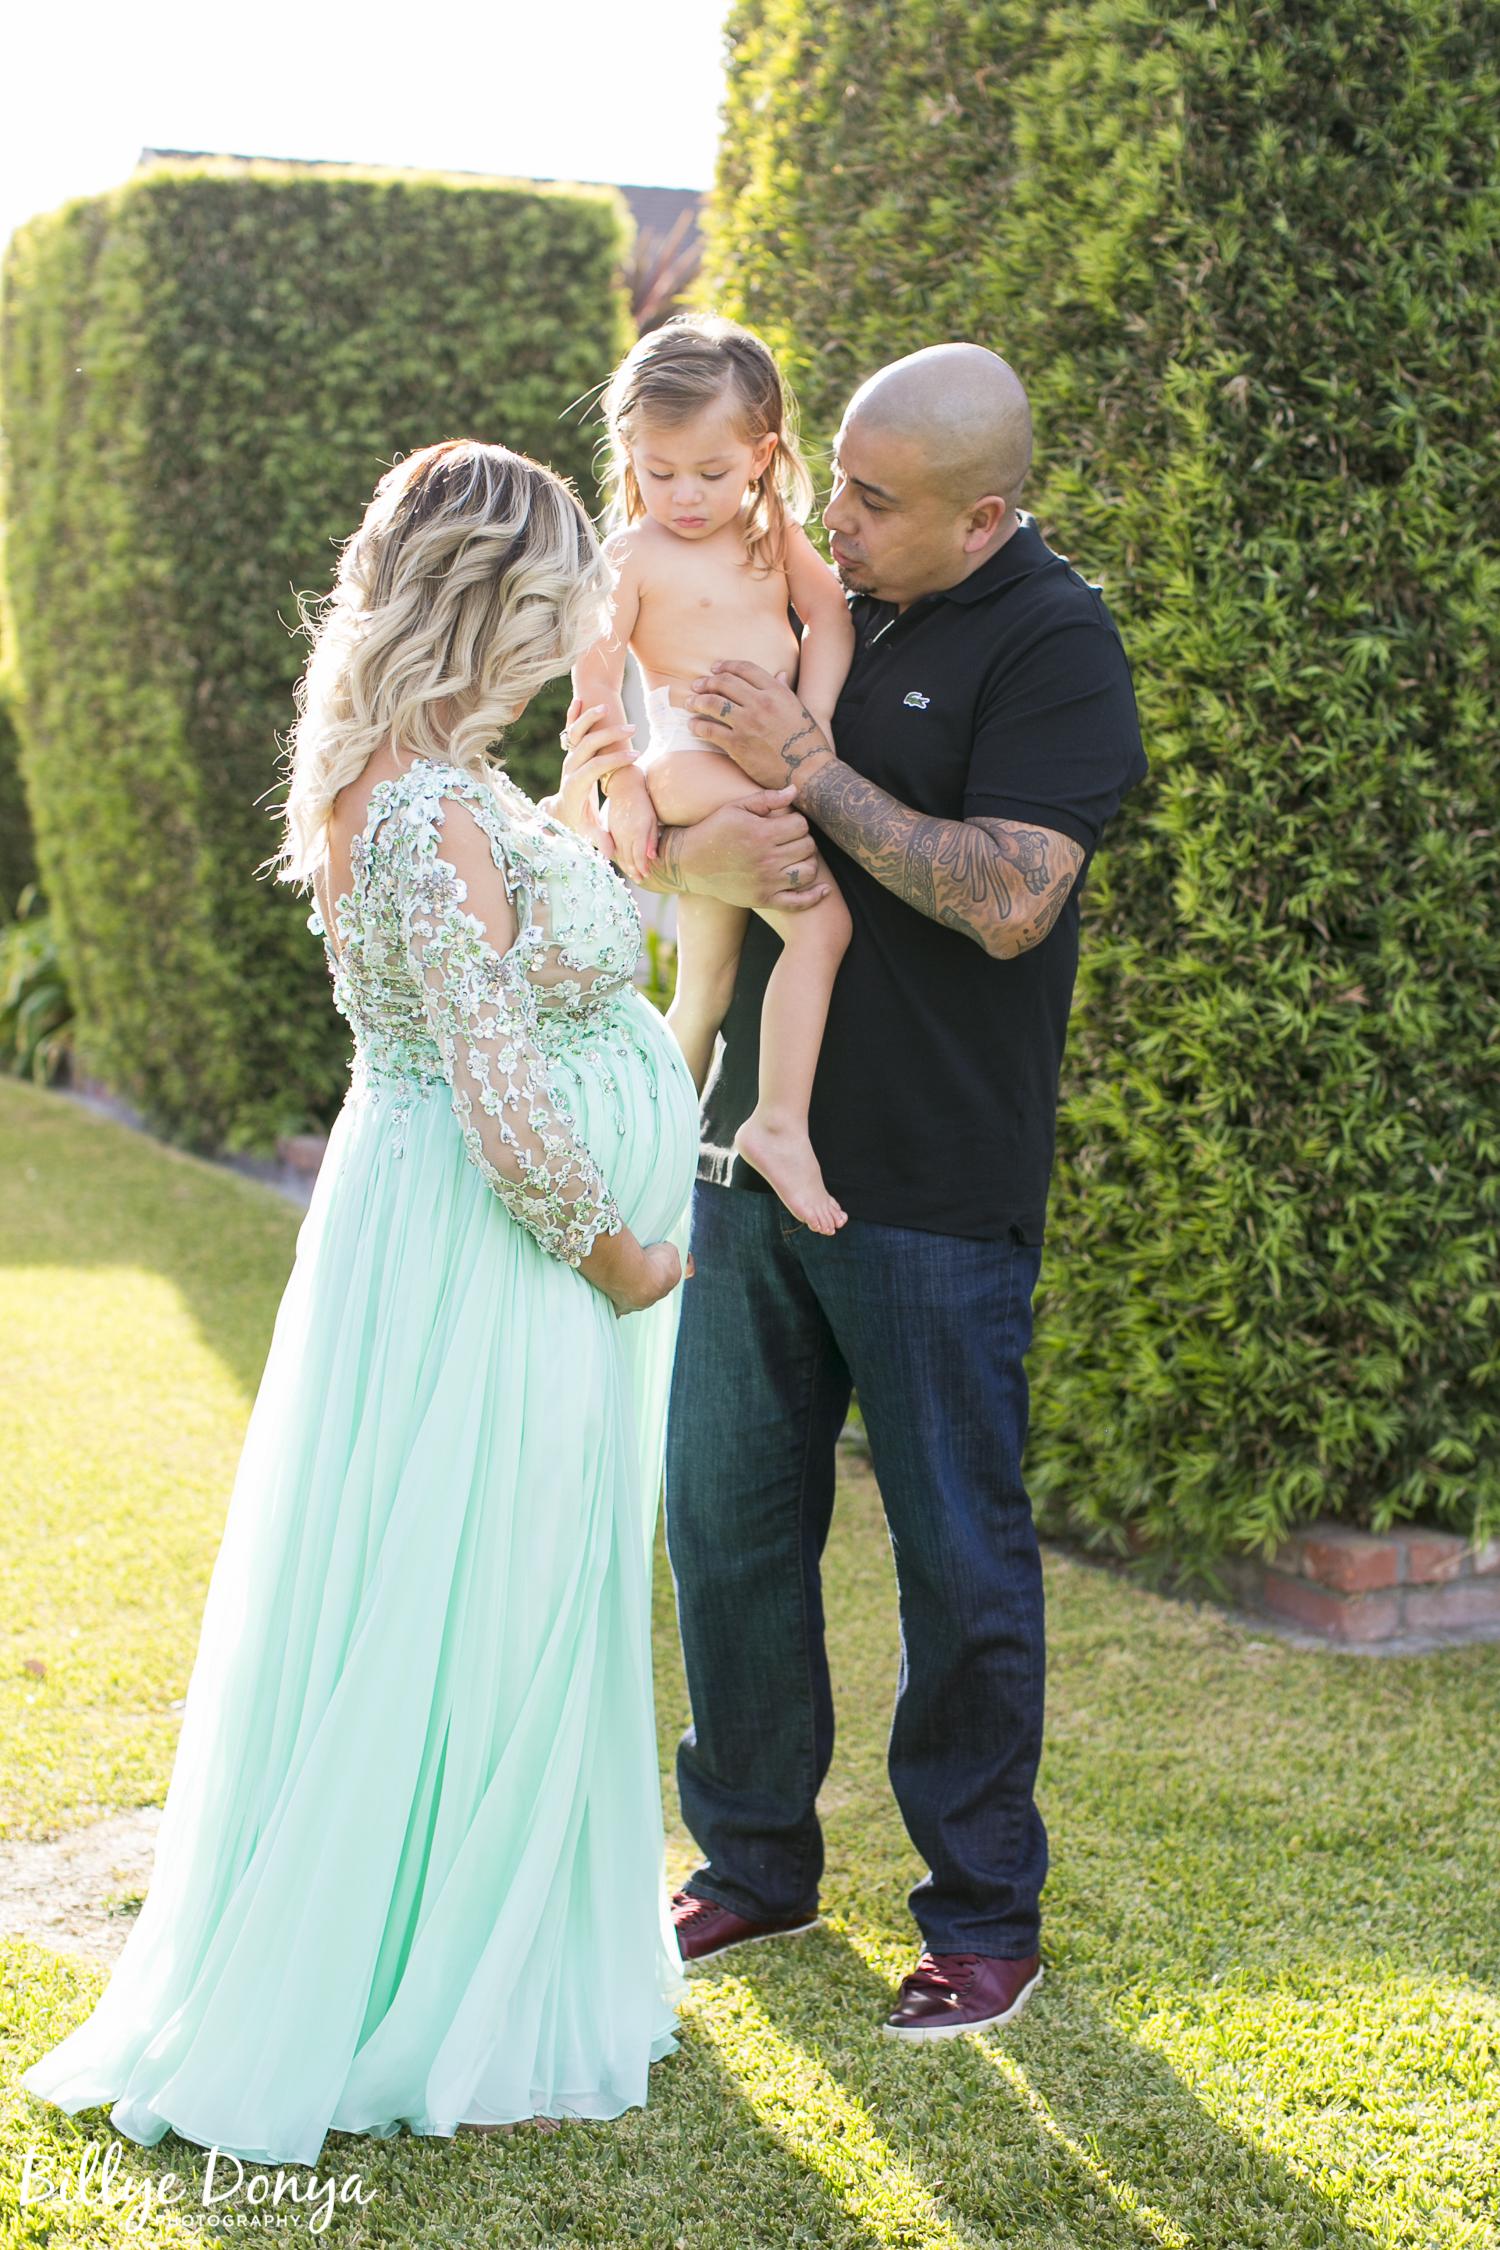 Los Angeles Family Photo-8.JPG